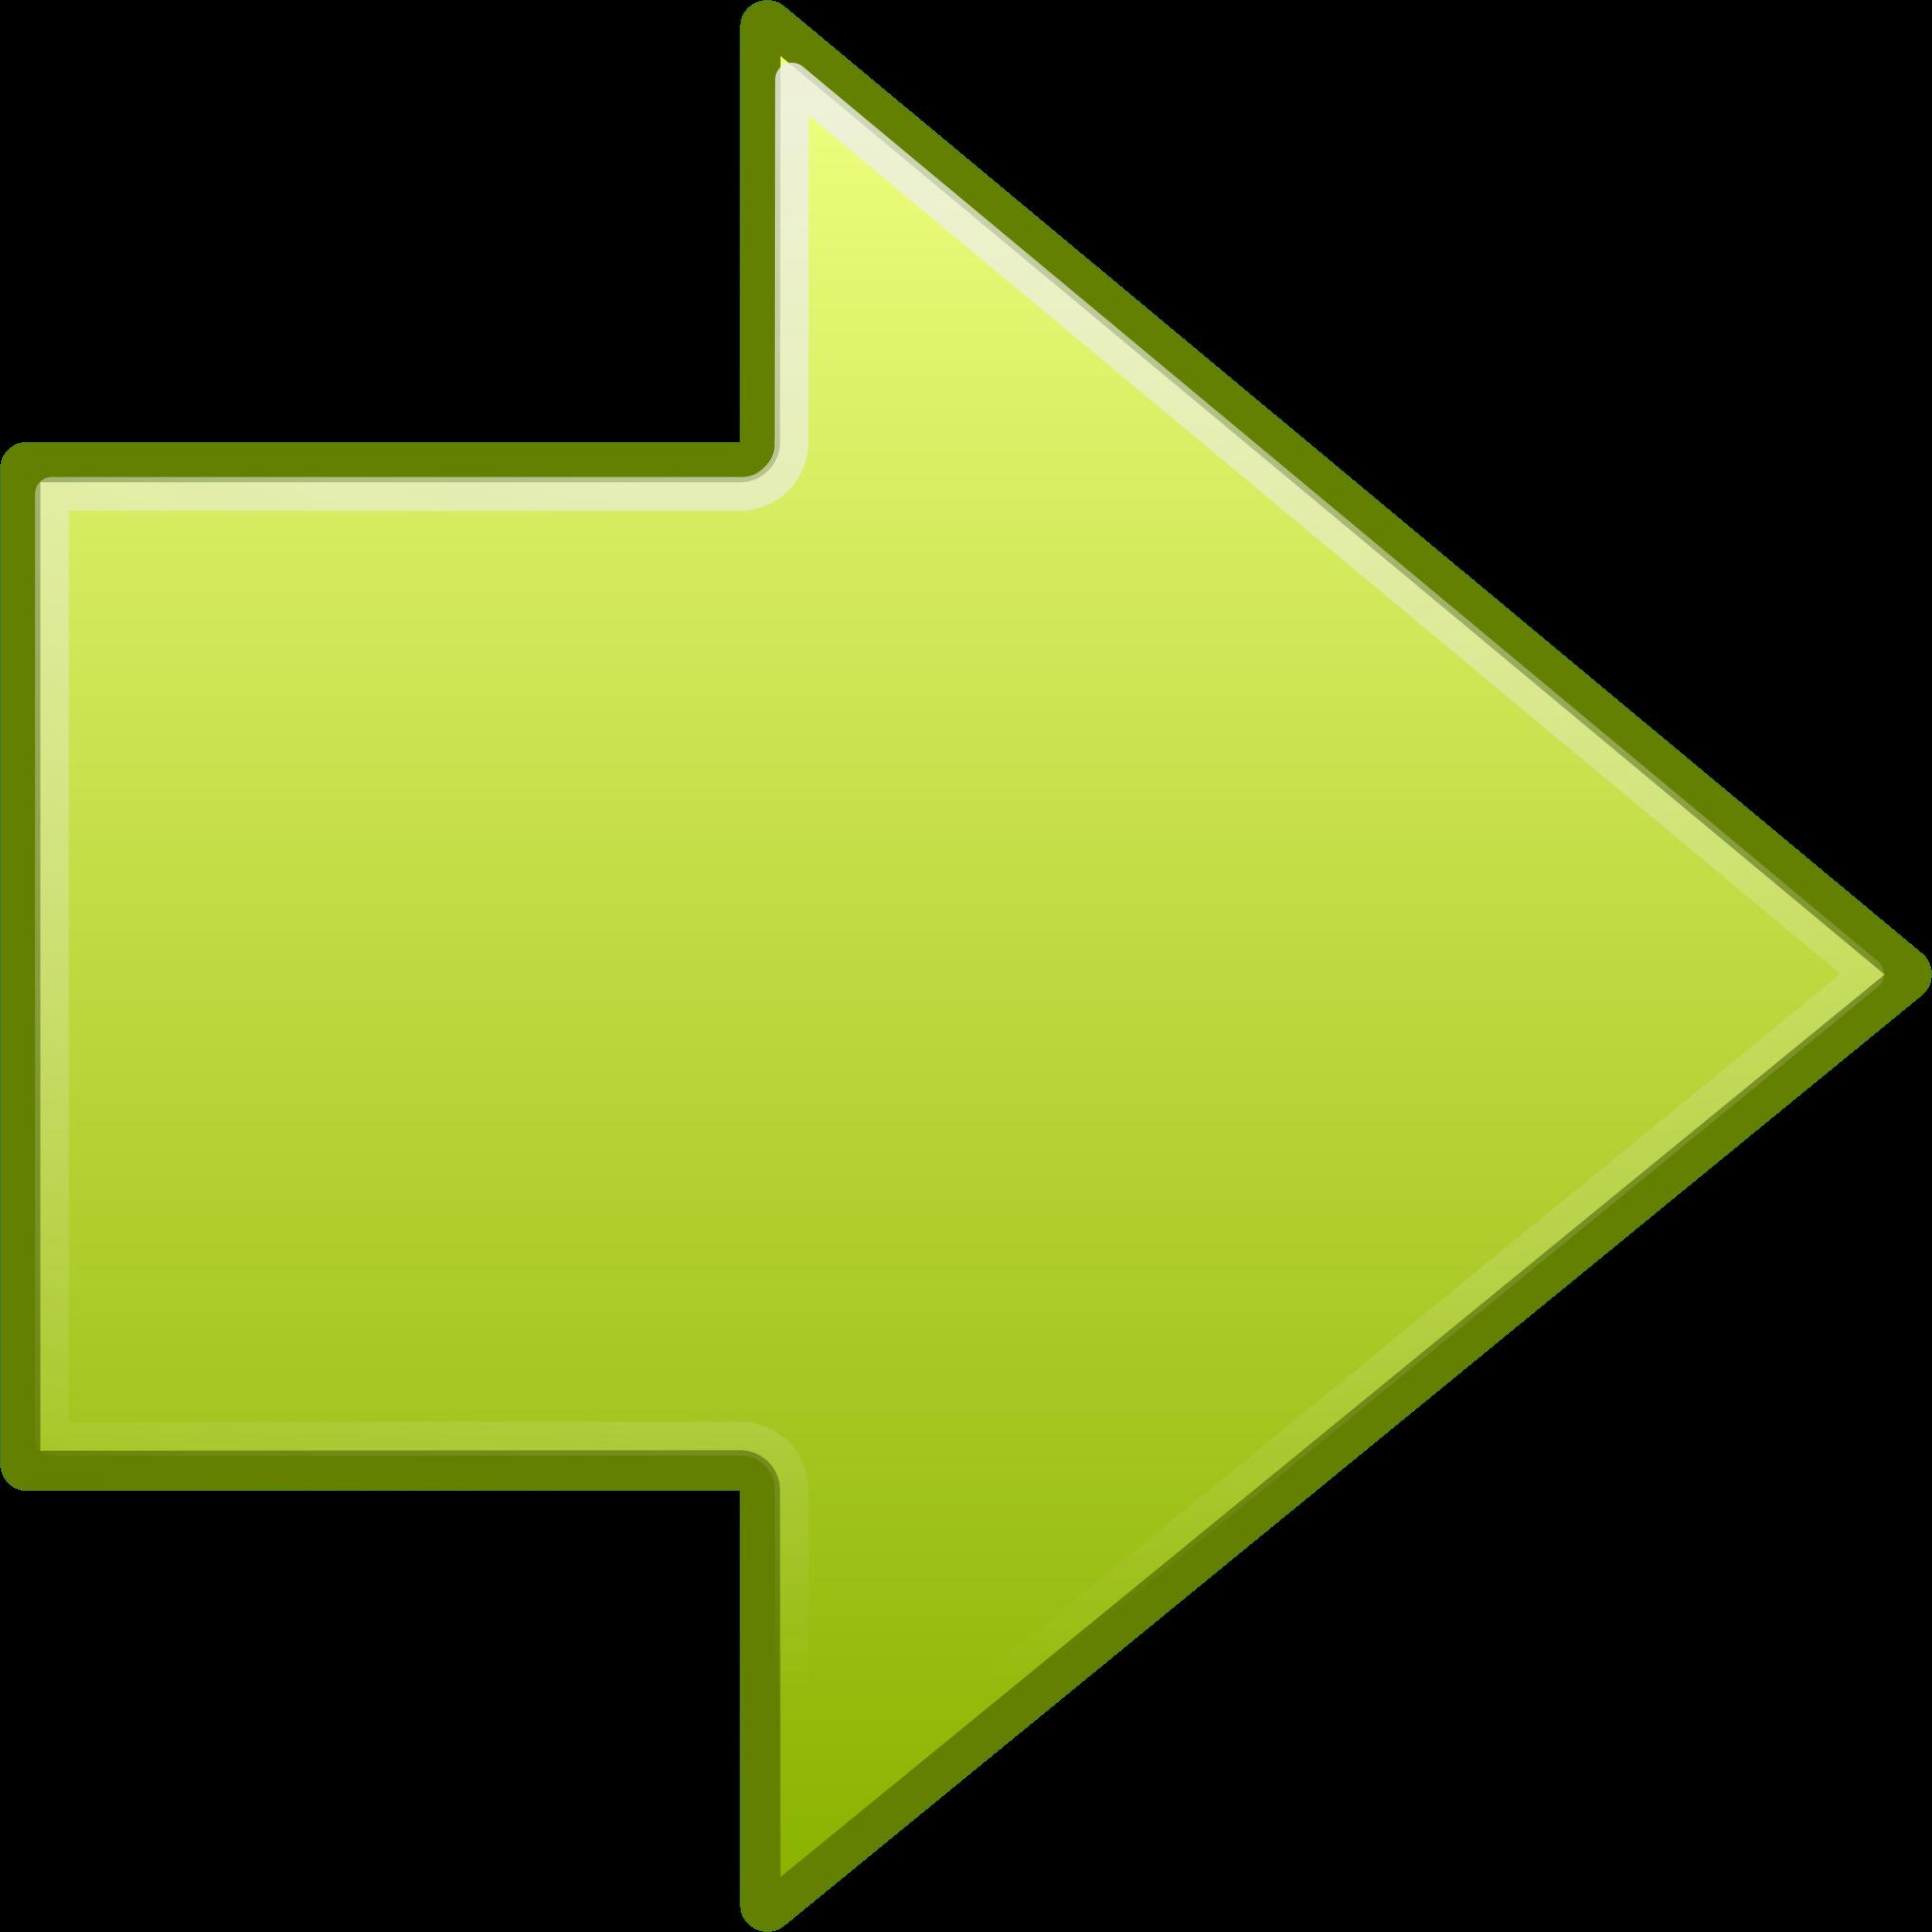 Arrow clipart picture transparent library Clipart - Go Next Arrow Icon picture transparent library